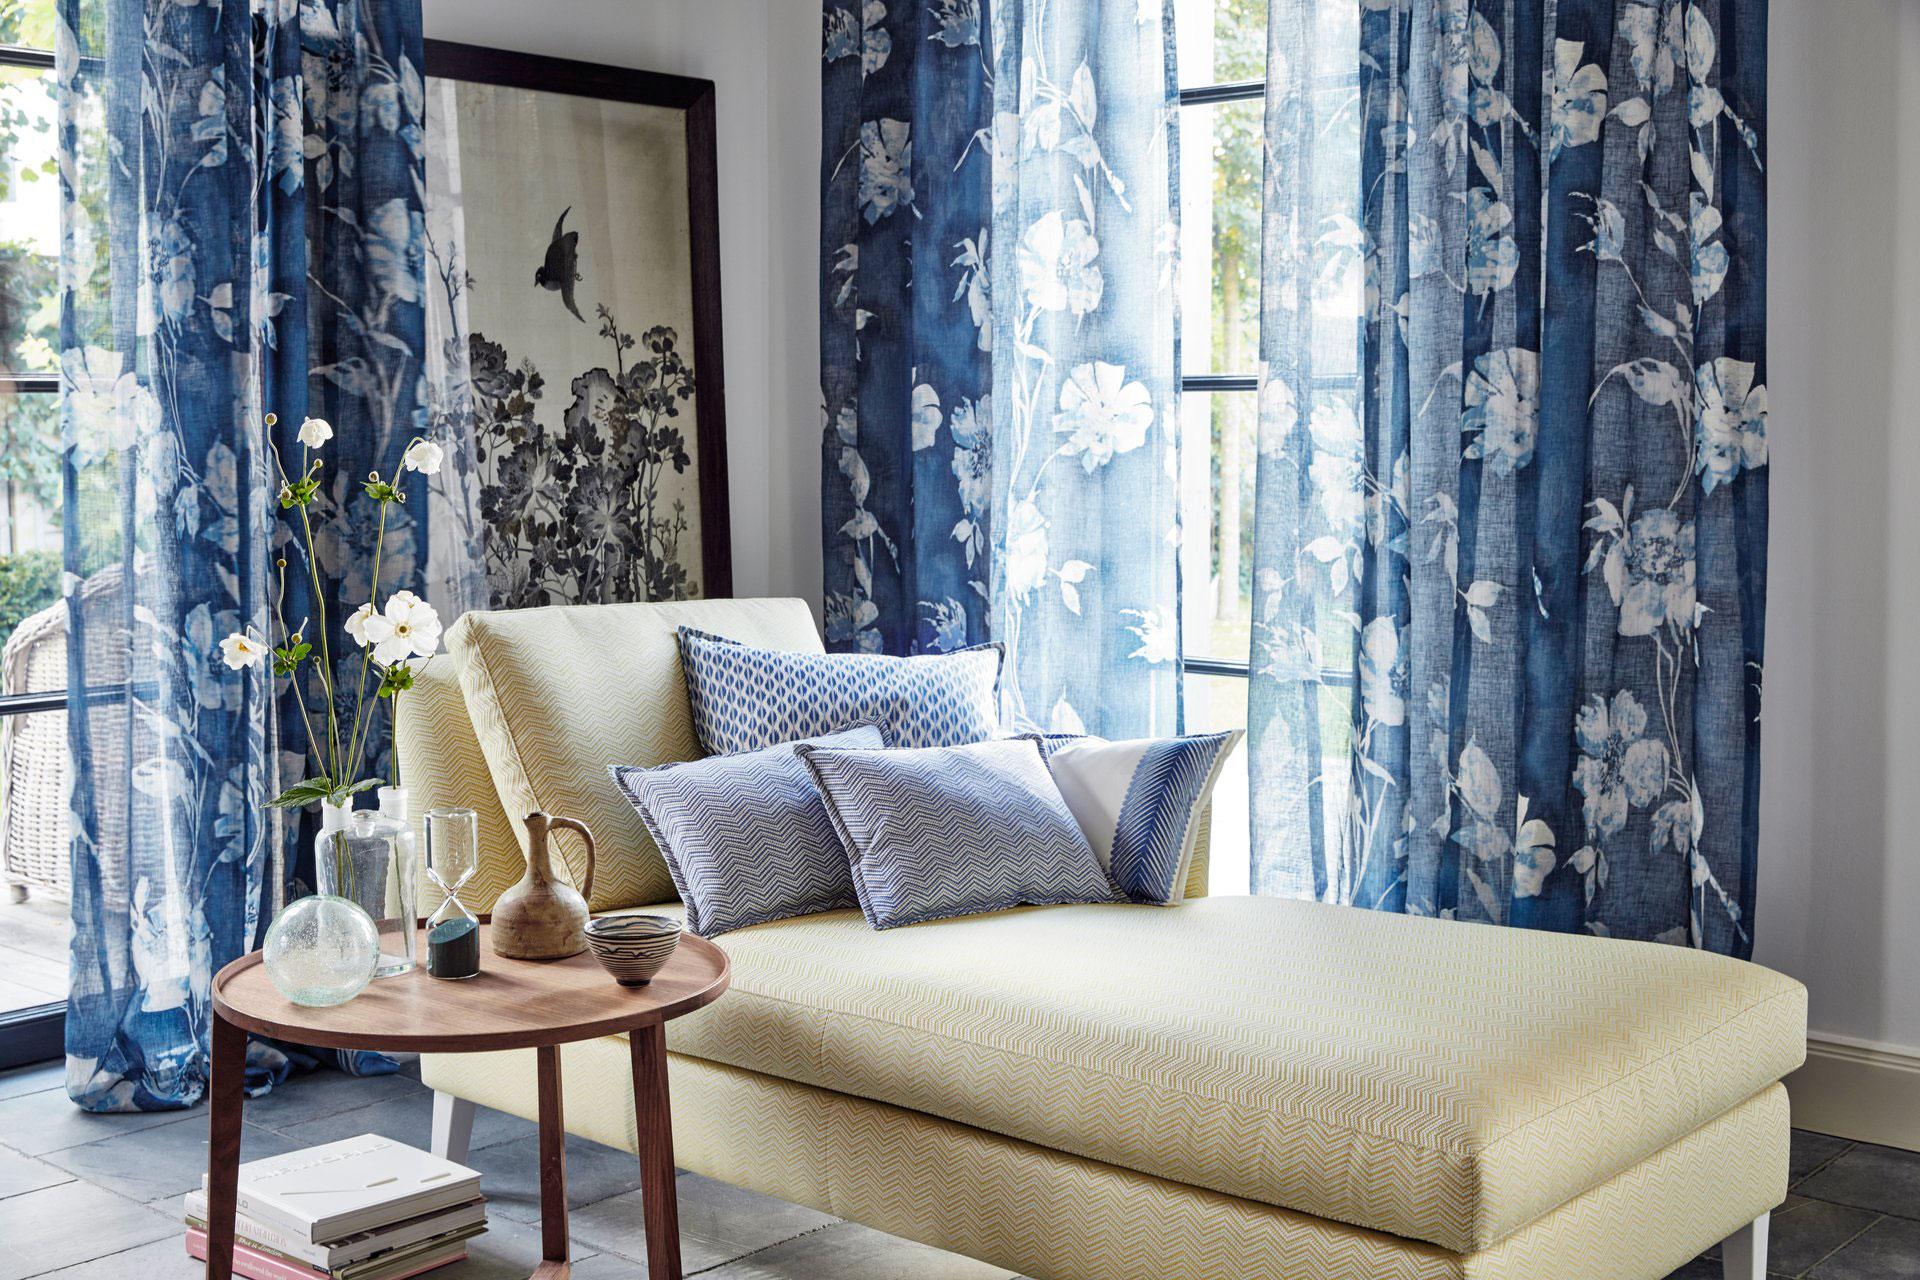 gardinen vorh nge sonnenschutz h ndler berlin. Black Bedroom Furniture Sets. Home Design Ideas